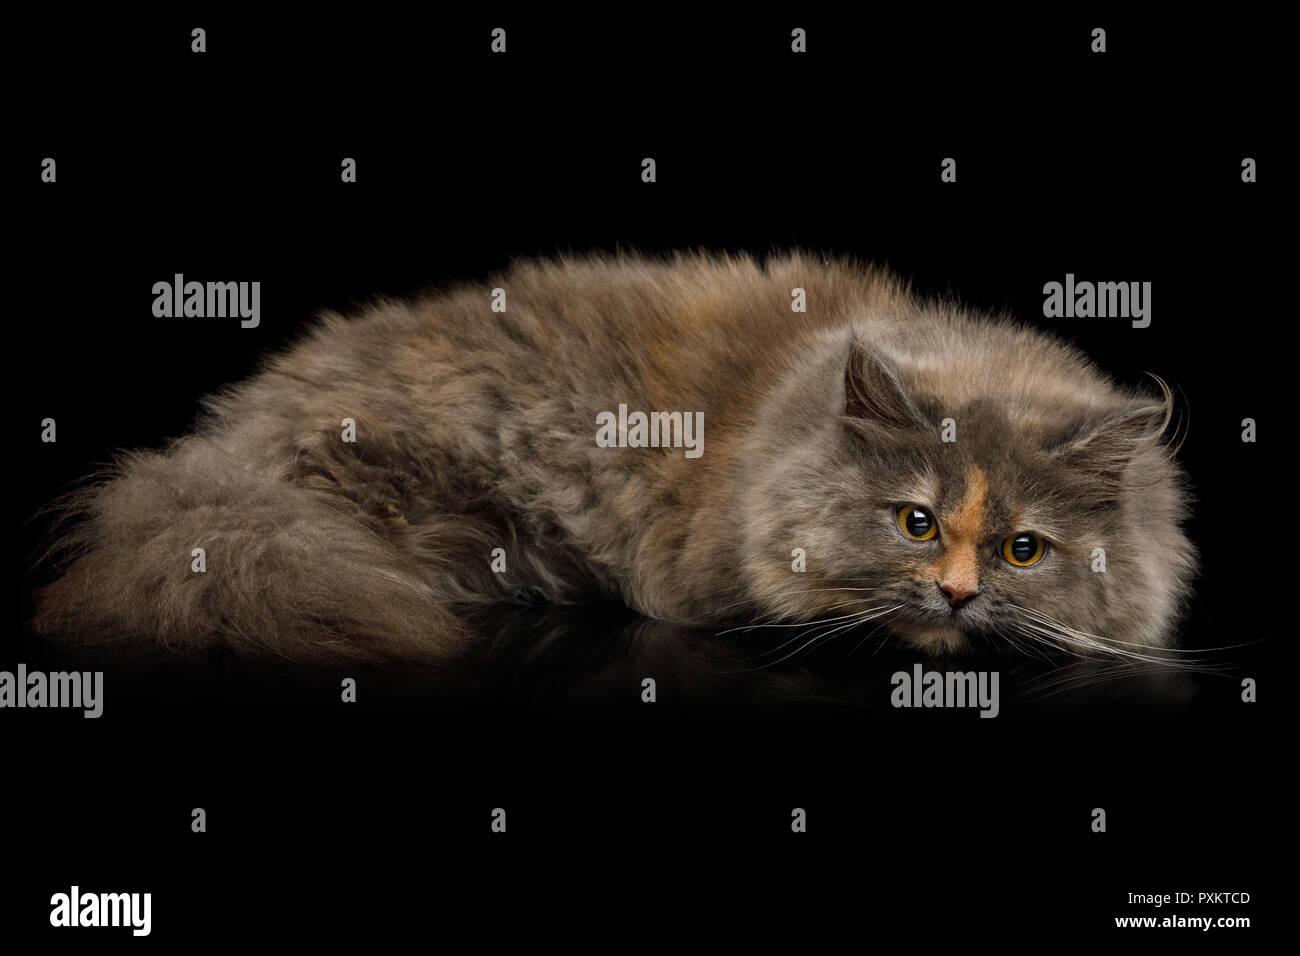 Gato de pêlo curto Munchkin tartaruga deitado sobre fundo preto isolado Imagens de Stock